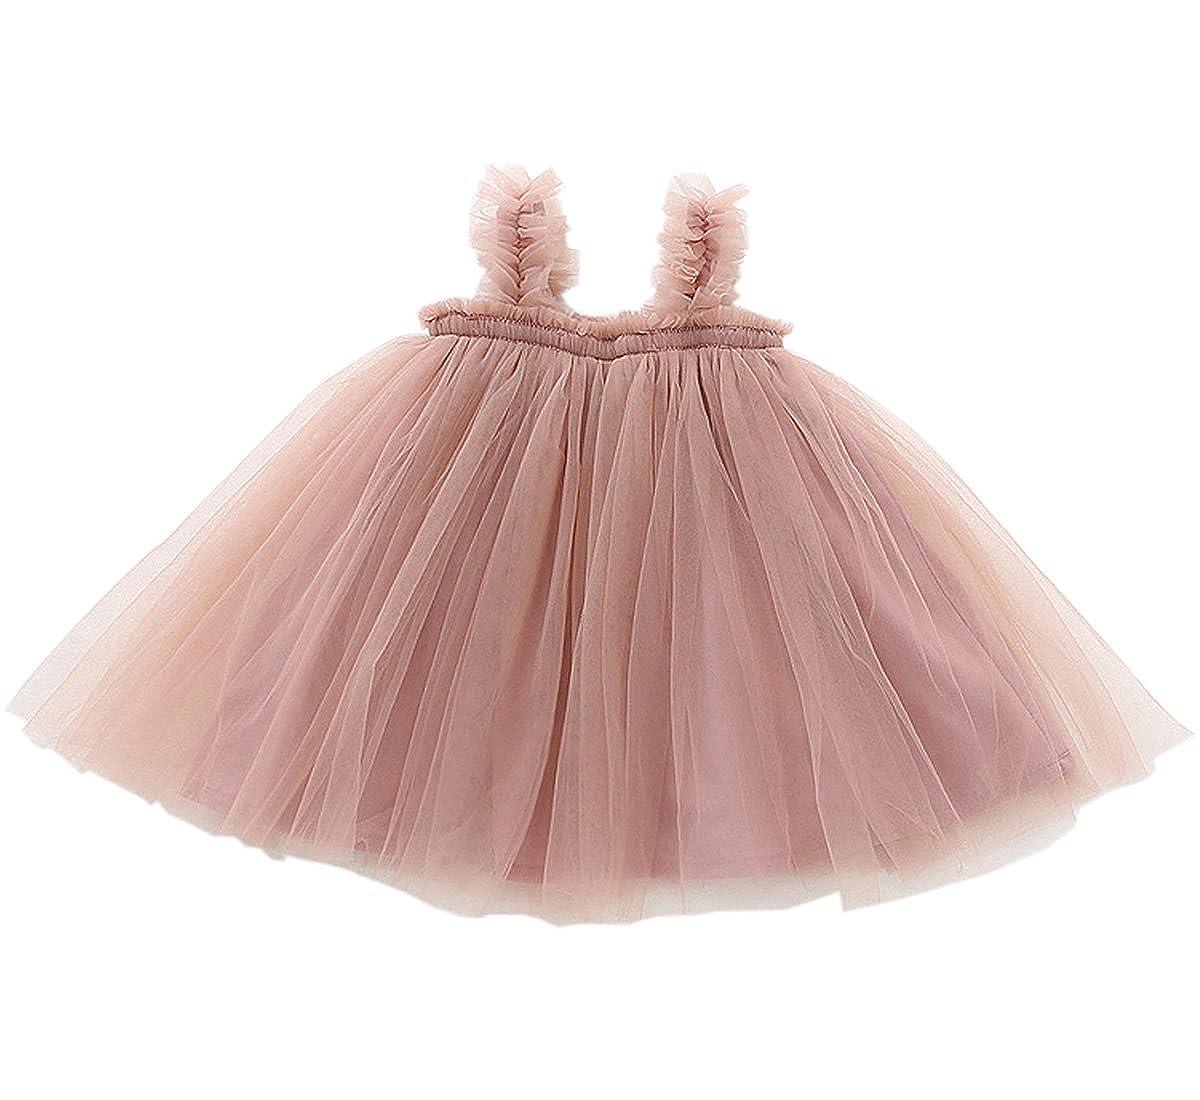 LYXIOF Baby Girls Toddler Tutu Dress Long Sleeve//Sleeveless Princess Infant Tulle Sundress